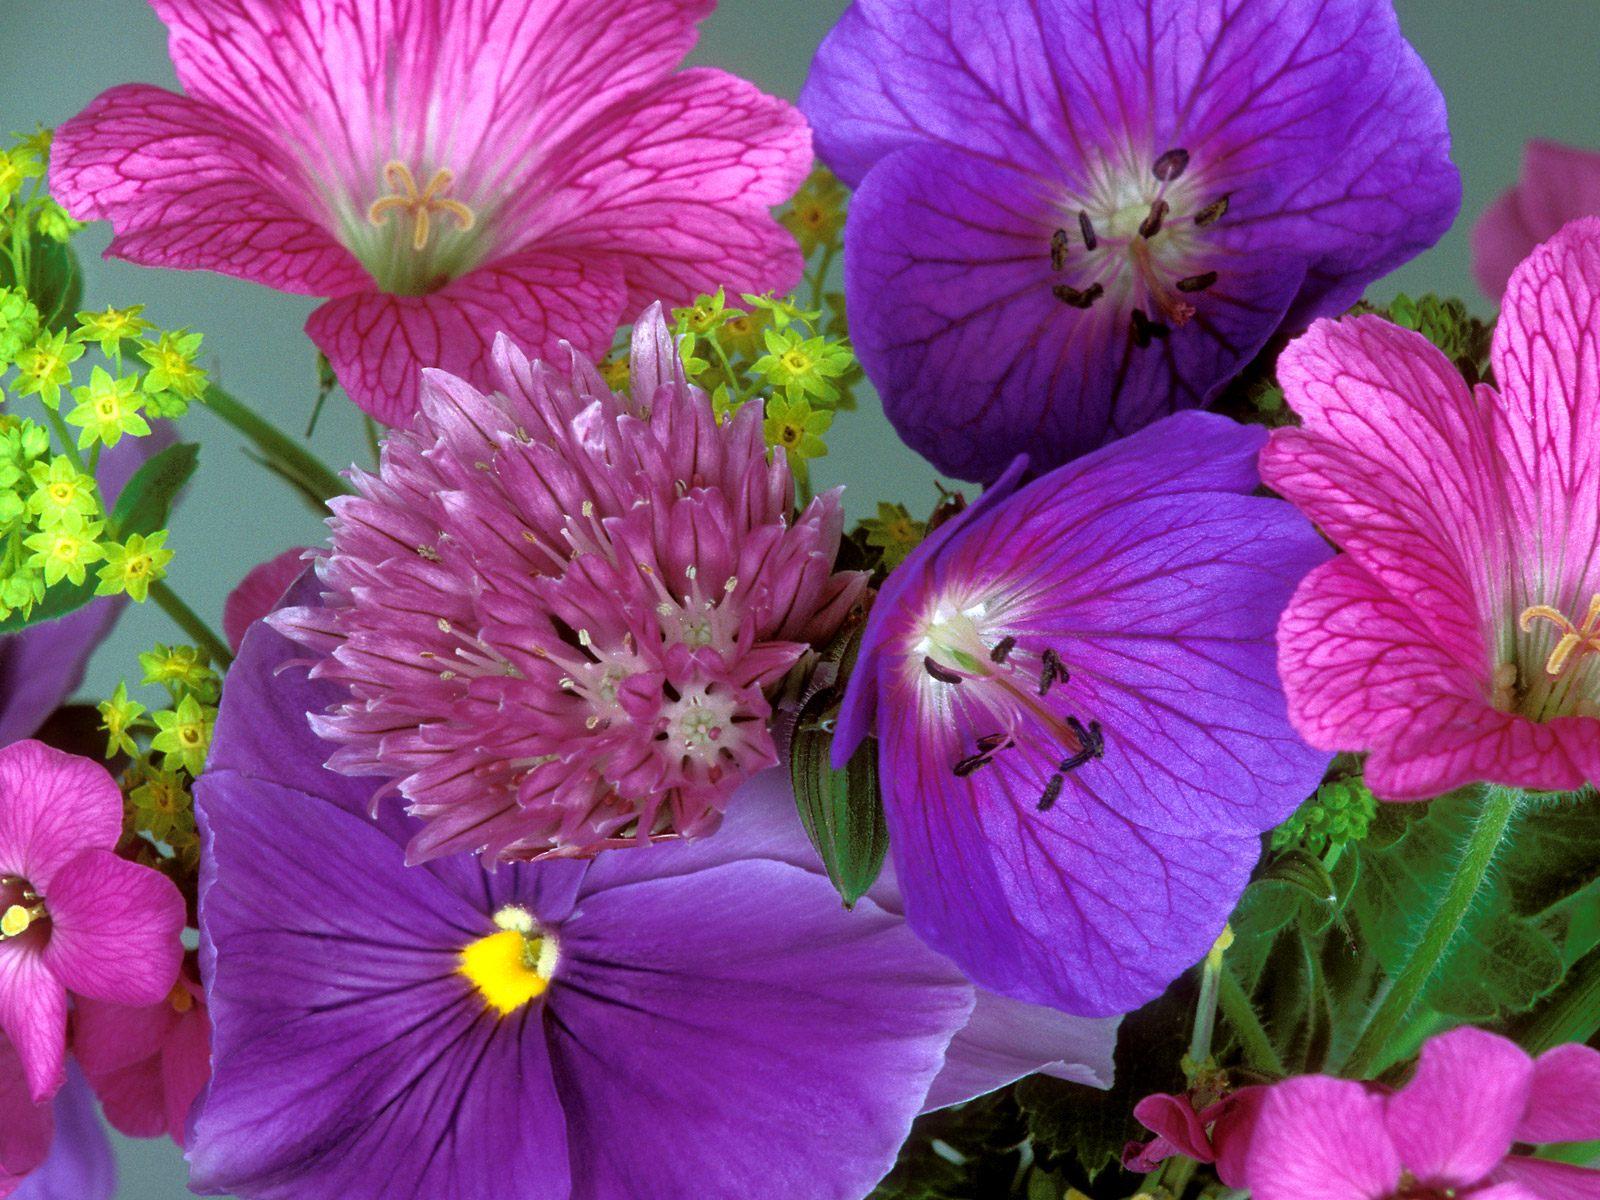 Beautiful Flowers | - photo#28